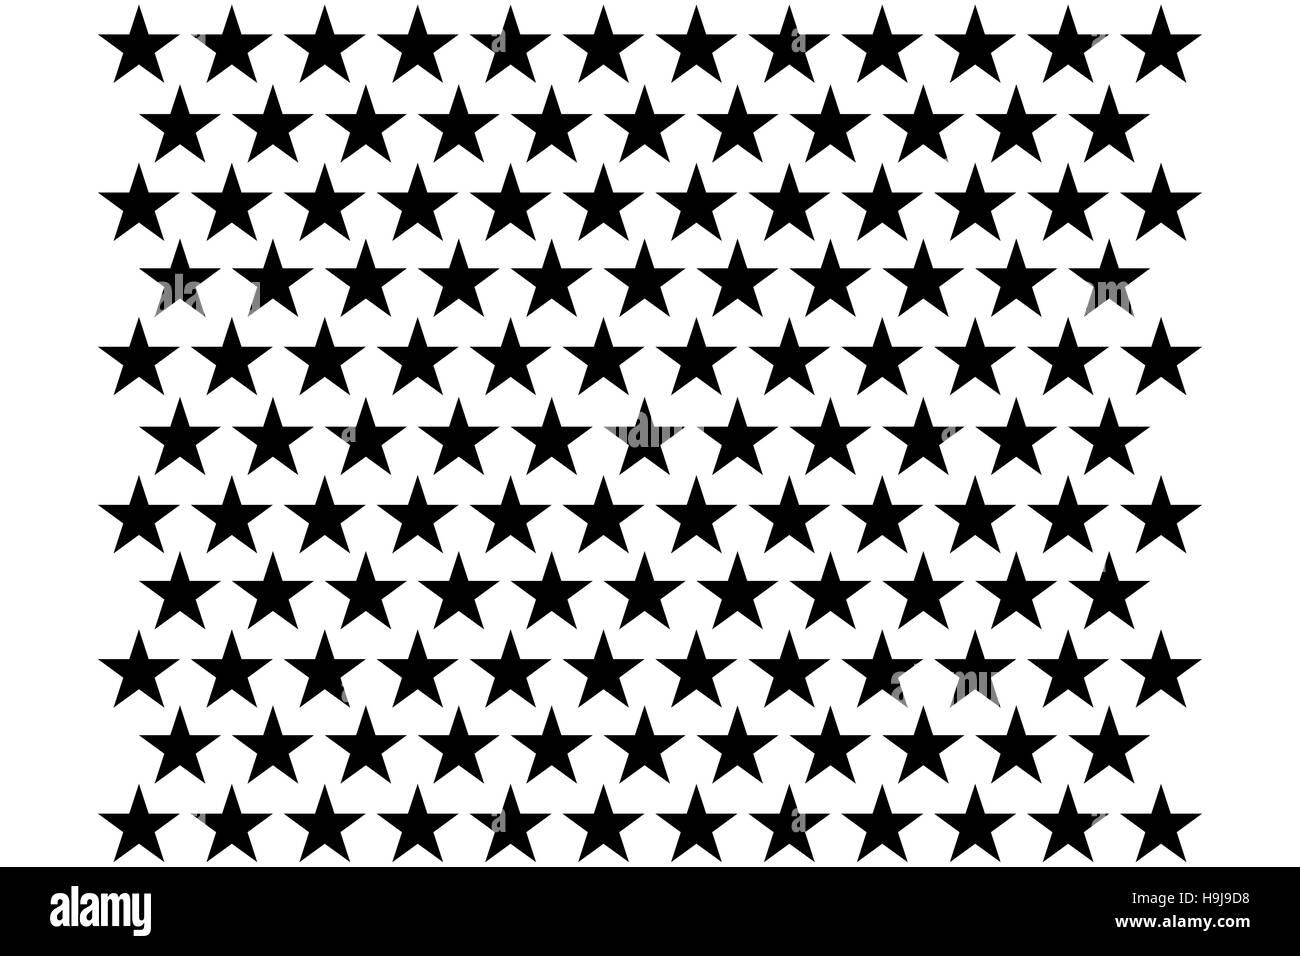 Digitally generated stars - Stock Image